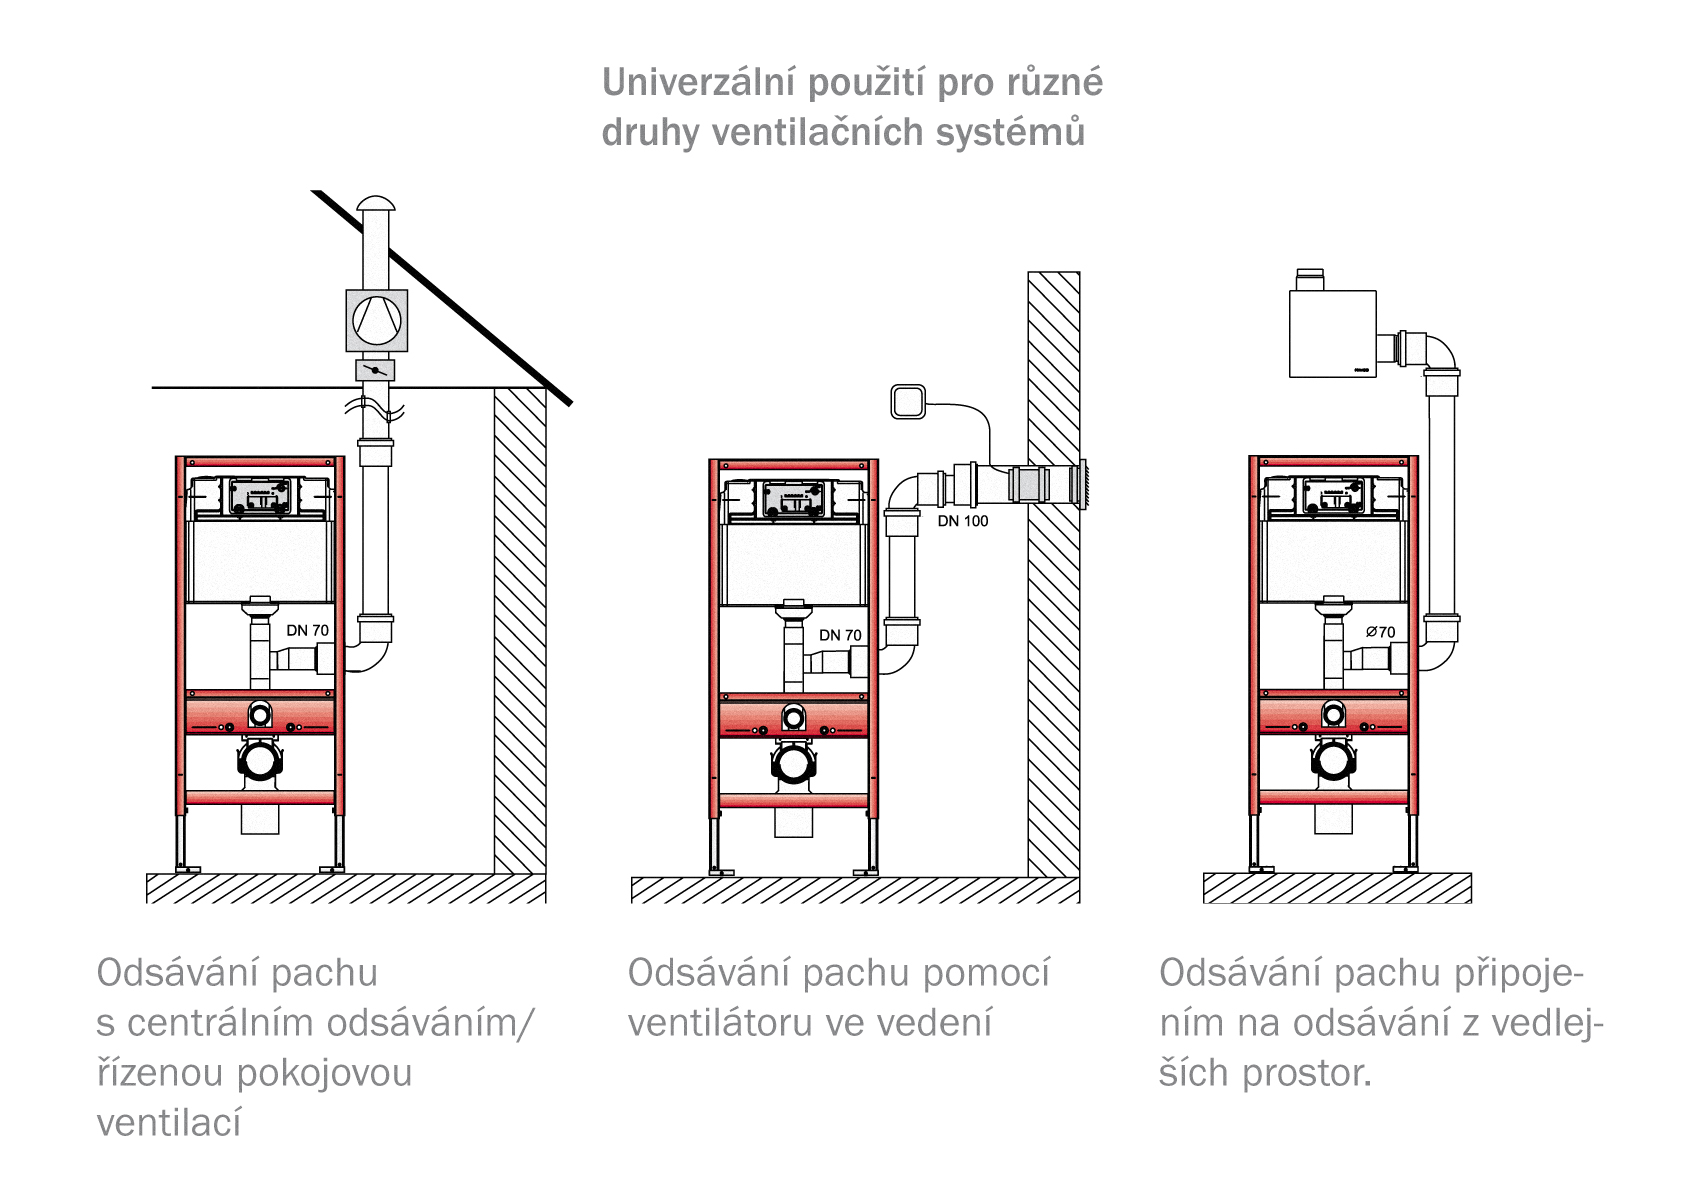 teceprofil montageelement f r wc geruchsabsaugung 1120 mm perfecto design. Black Bedroom Furniture Sets. Home Design Ideas